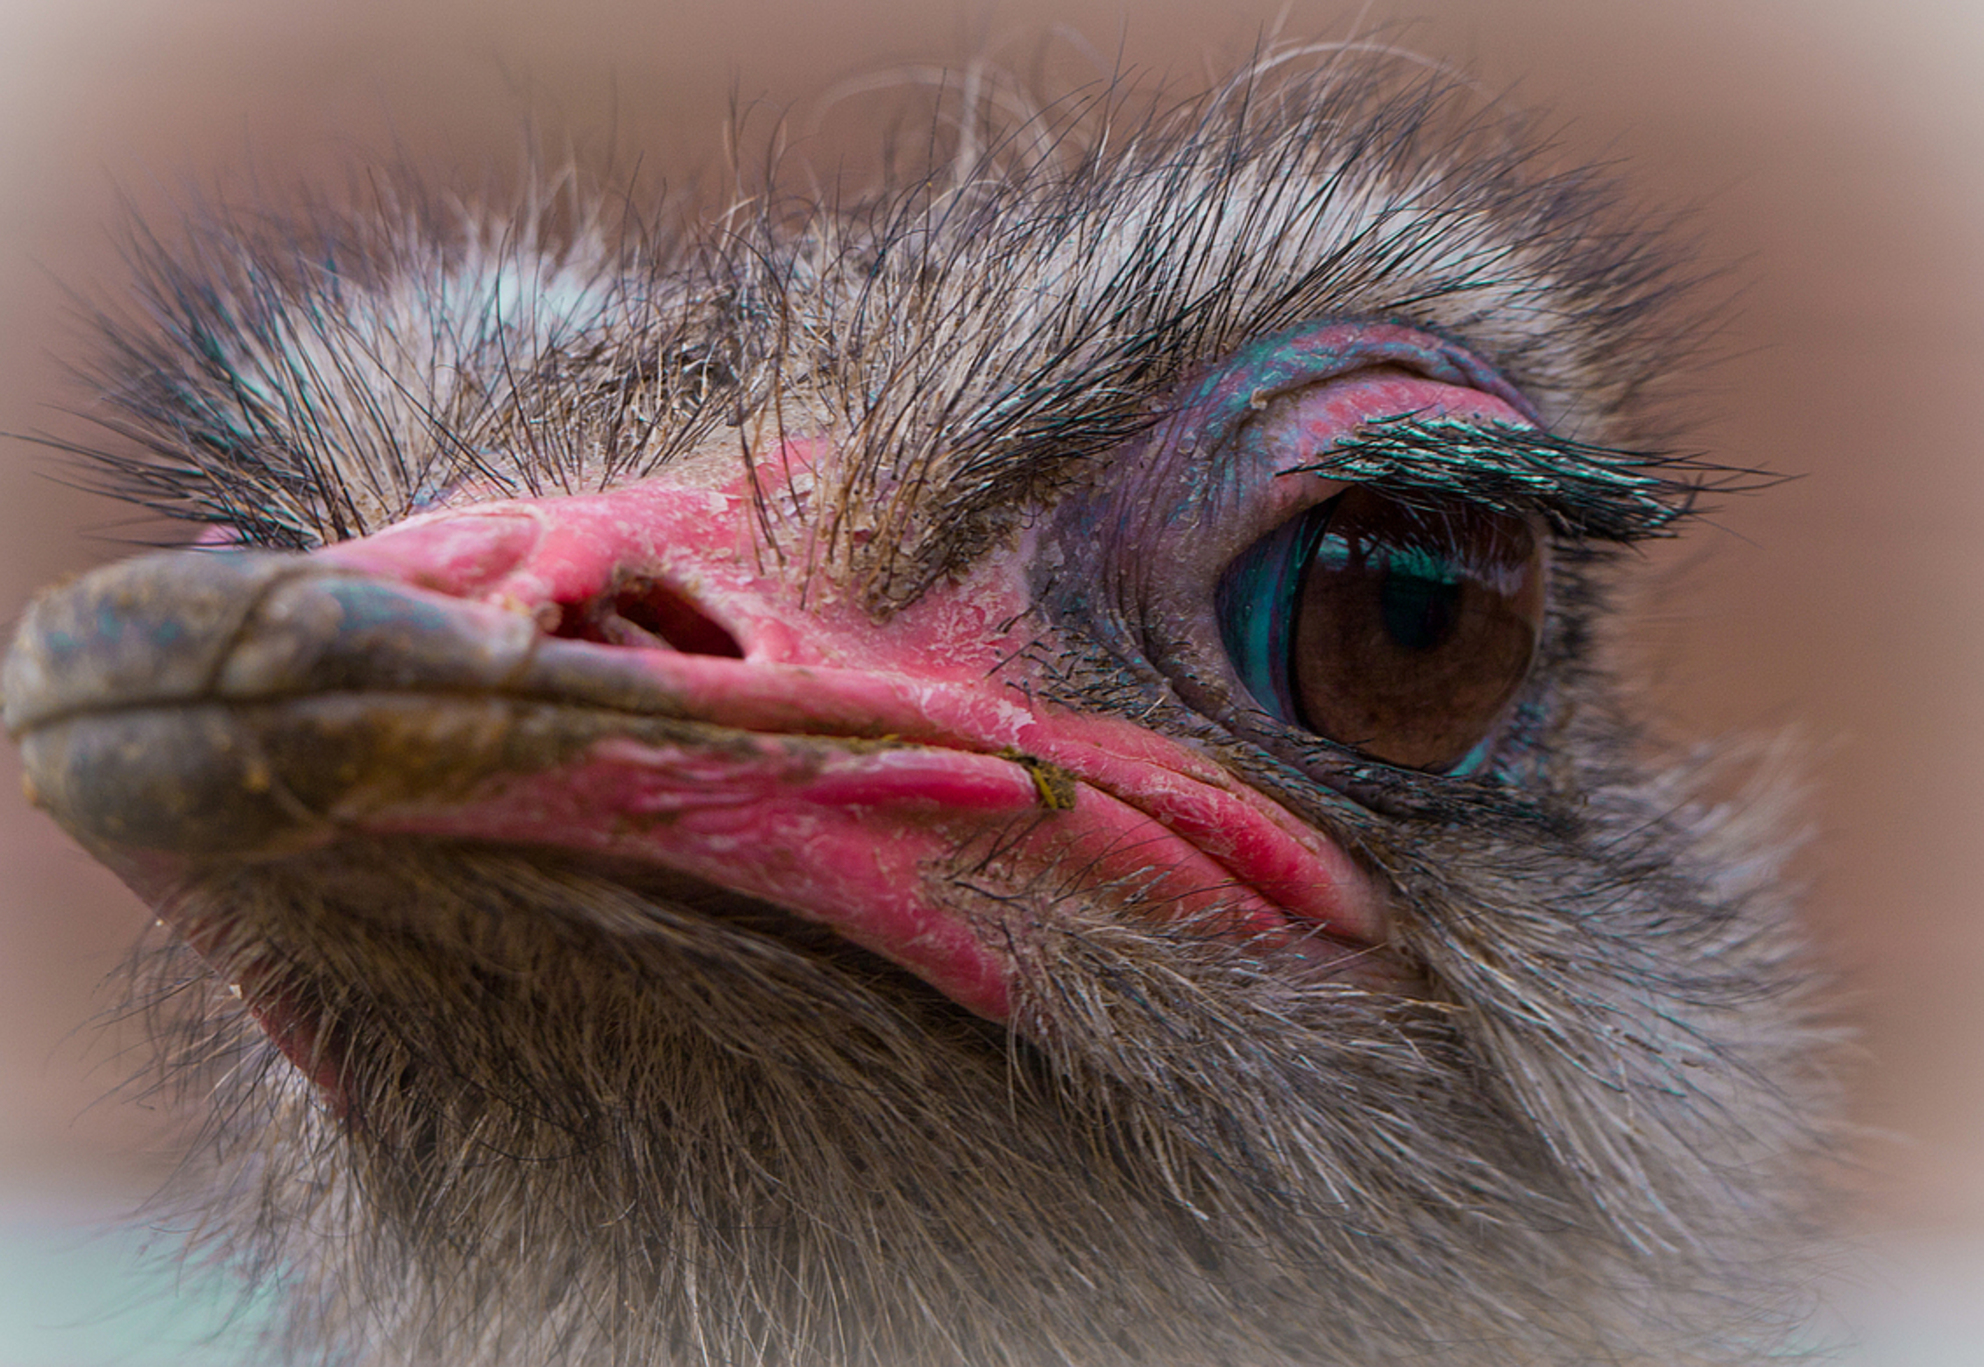 ***** Kiekeboe ***** - Kiekeboe ... hier ben ik weer!  Foto is gemaakt in Dierg@@rde Blijdorp!  Groet, Ruud - foto door kyano09 op 03-04-2013 - deze foto bevat: foto, kleur, rotterdam, struisvogel, dierentuin, natuur, vogels, dieren, vogel, dier, struisvogels, zoo, diergaarde, fotos, dierentuinen